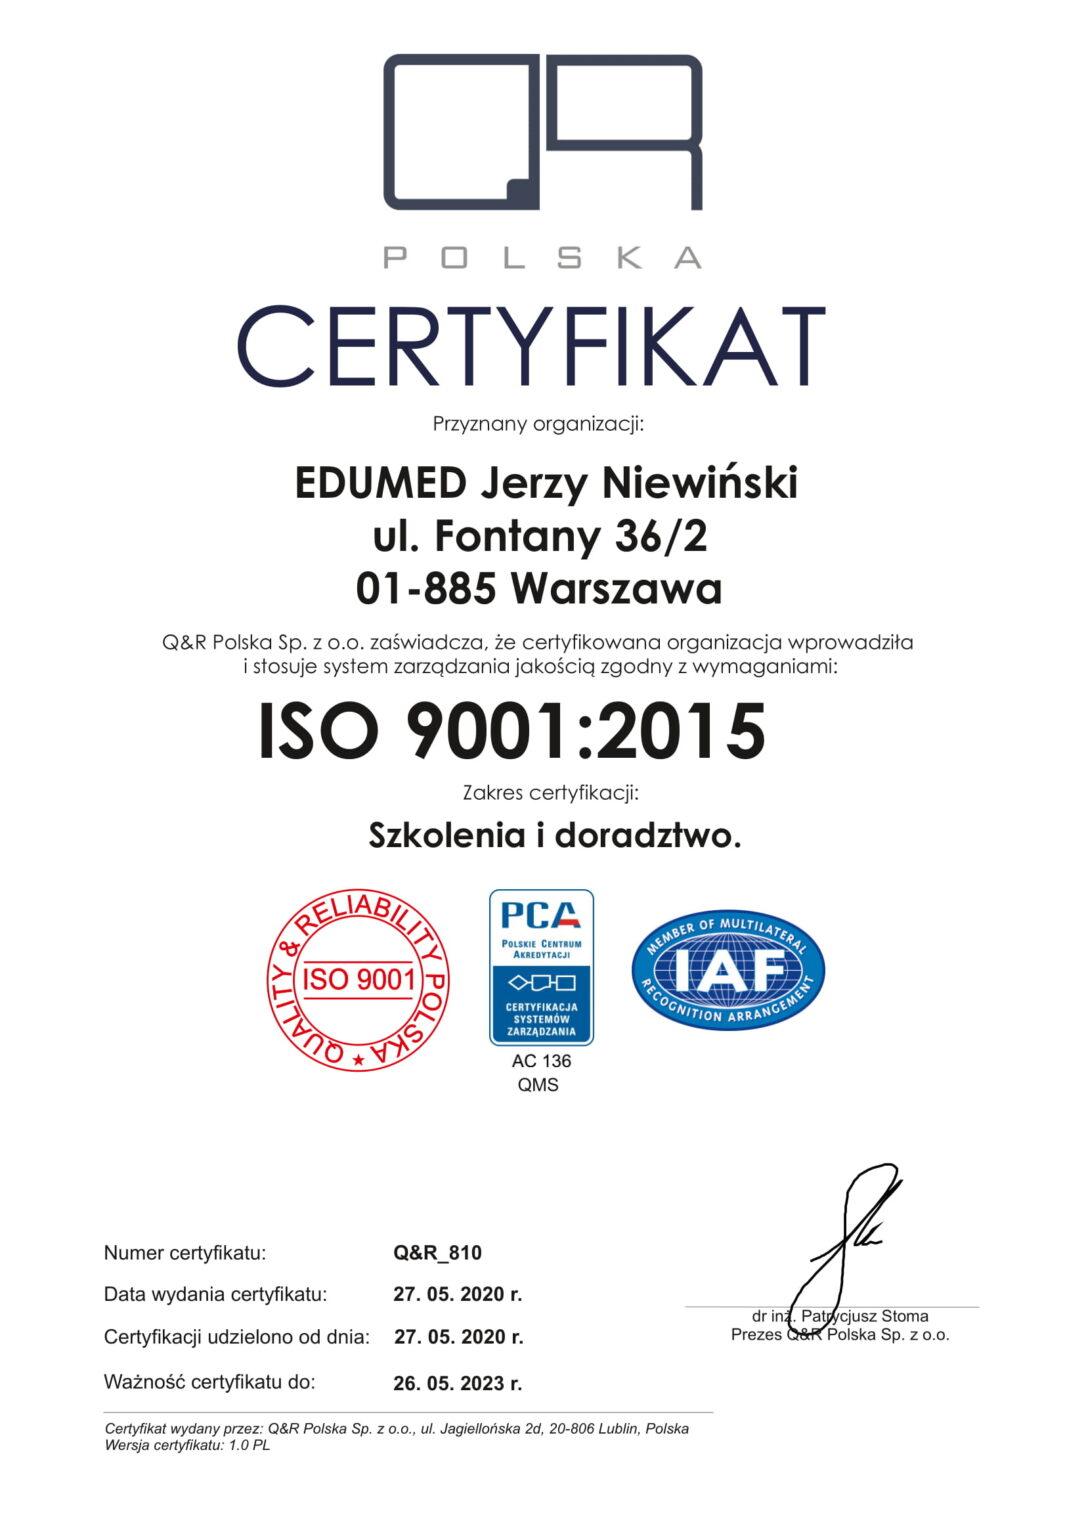 certyfikat QR 810 ver 1.0 2020